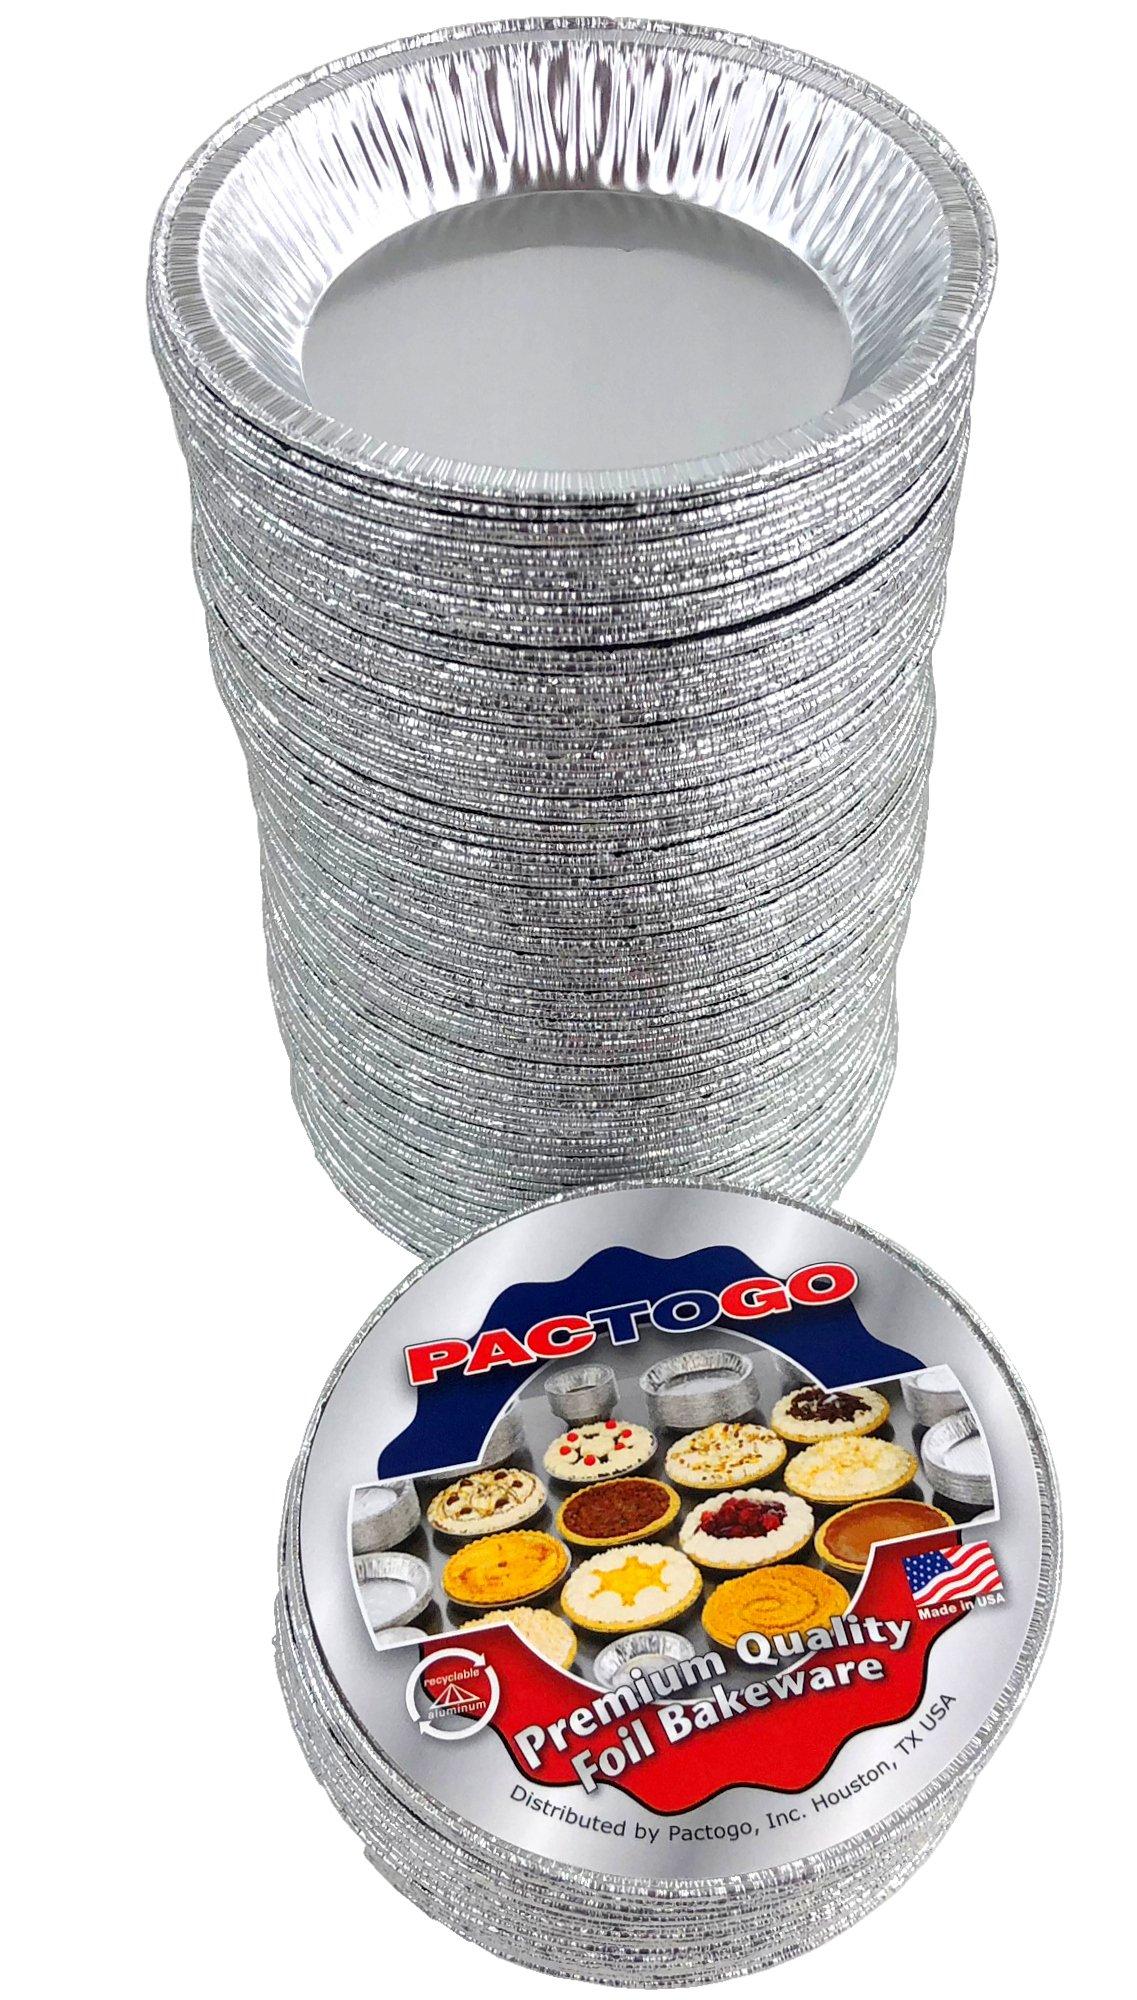 Pactogo 4 1/2'' Foil Tart Pan 7/8'' Deep - Mini Baking Pie Tins (Pack of 500) by PACTOGO (Image #6)